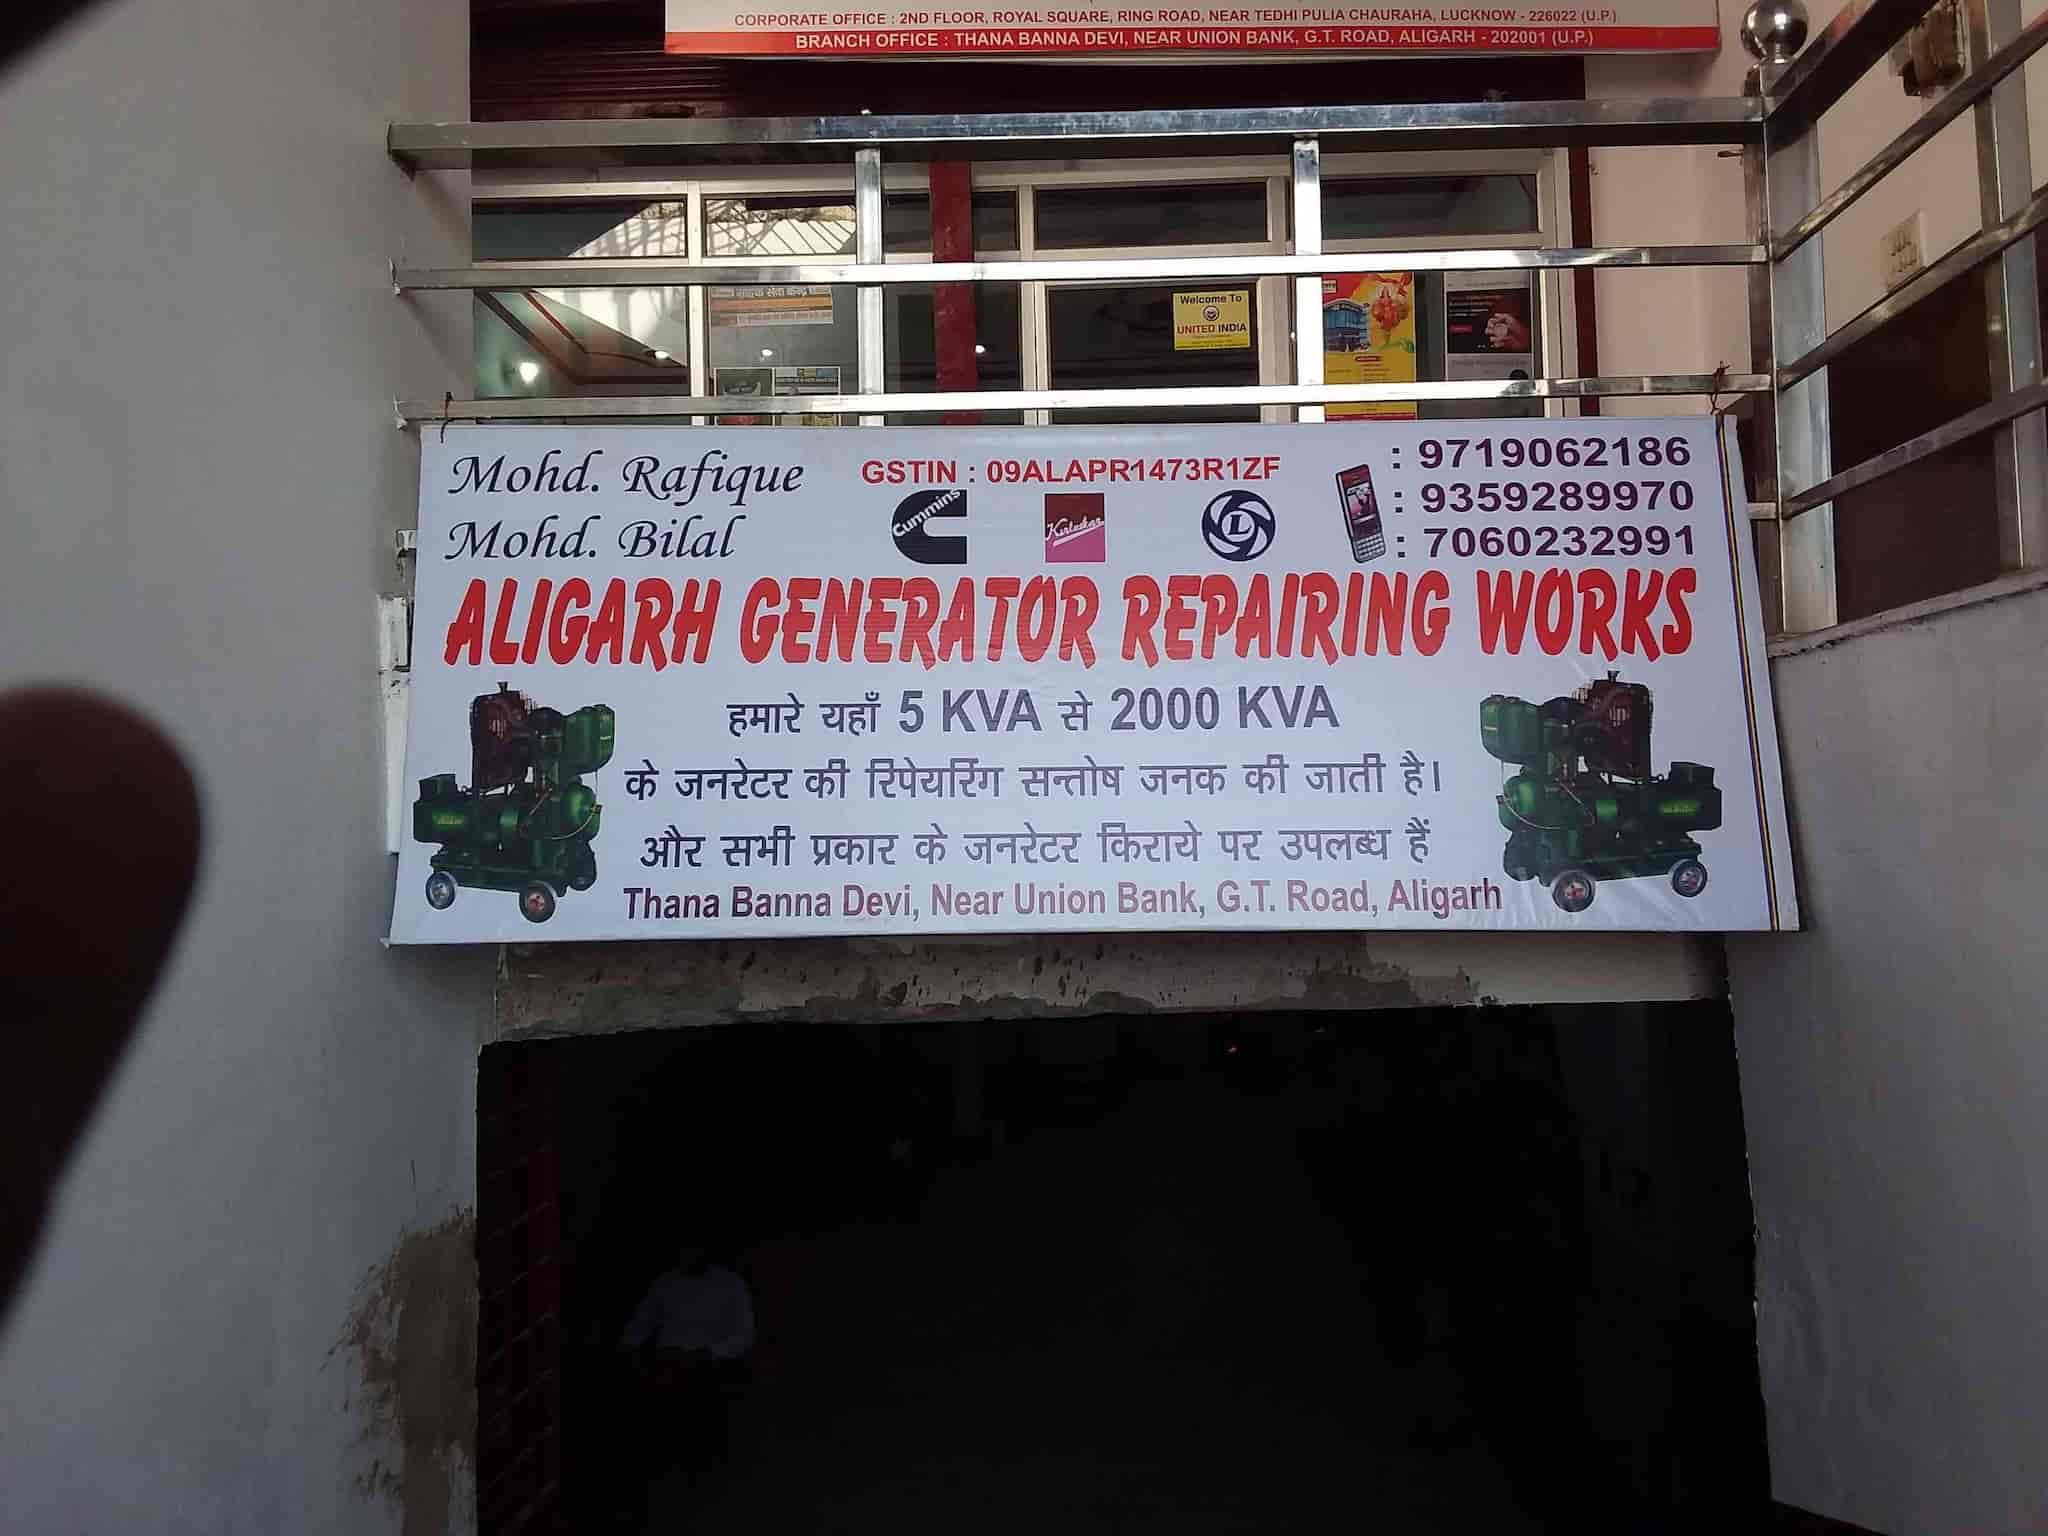 Aligarh Generator Repairing Works, Opposite Exibition Ground